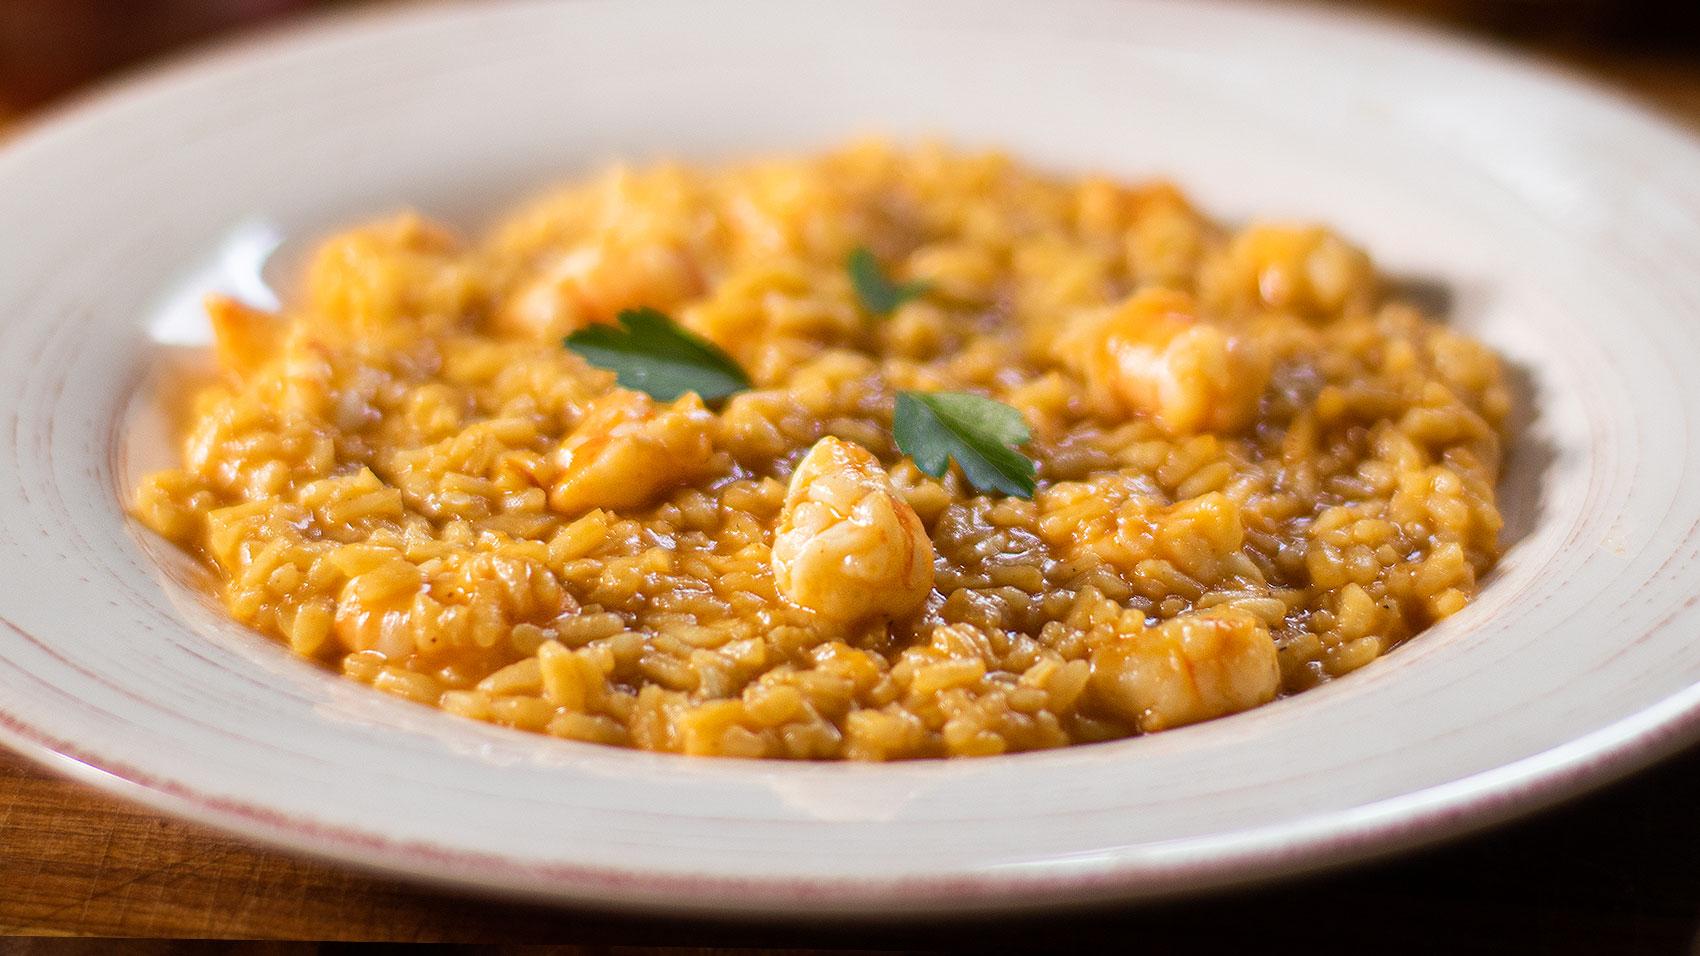 Shrimp or prawn risotto